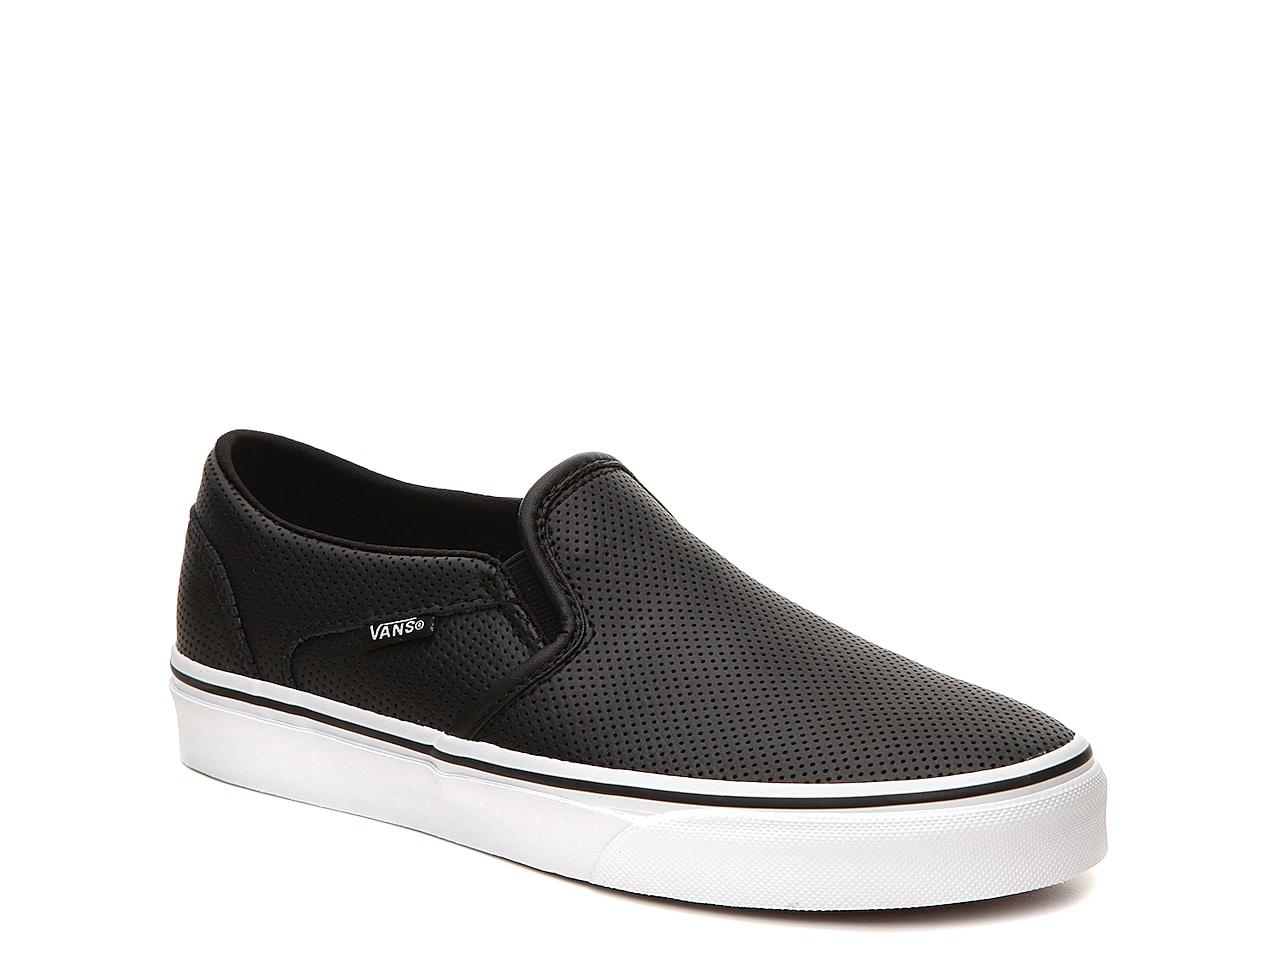 Asher Perforated Slip-On Sneaker - Women's